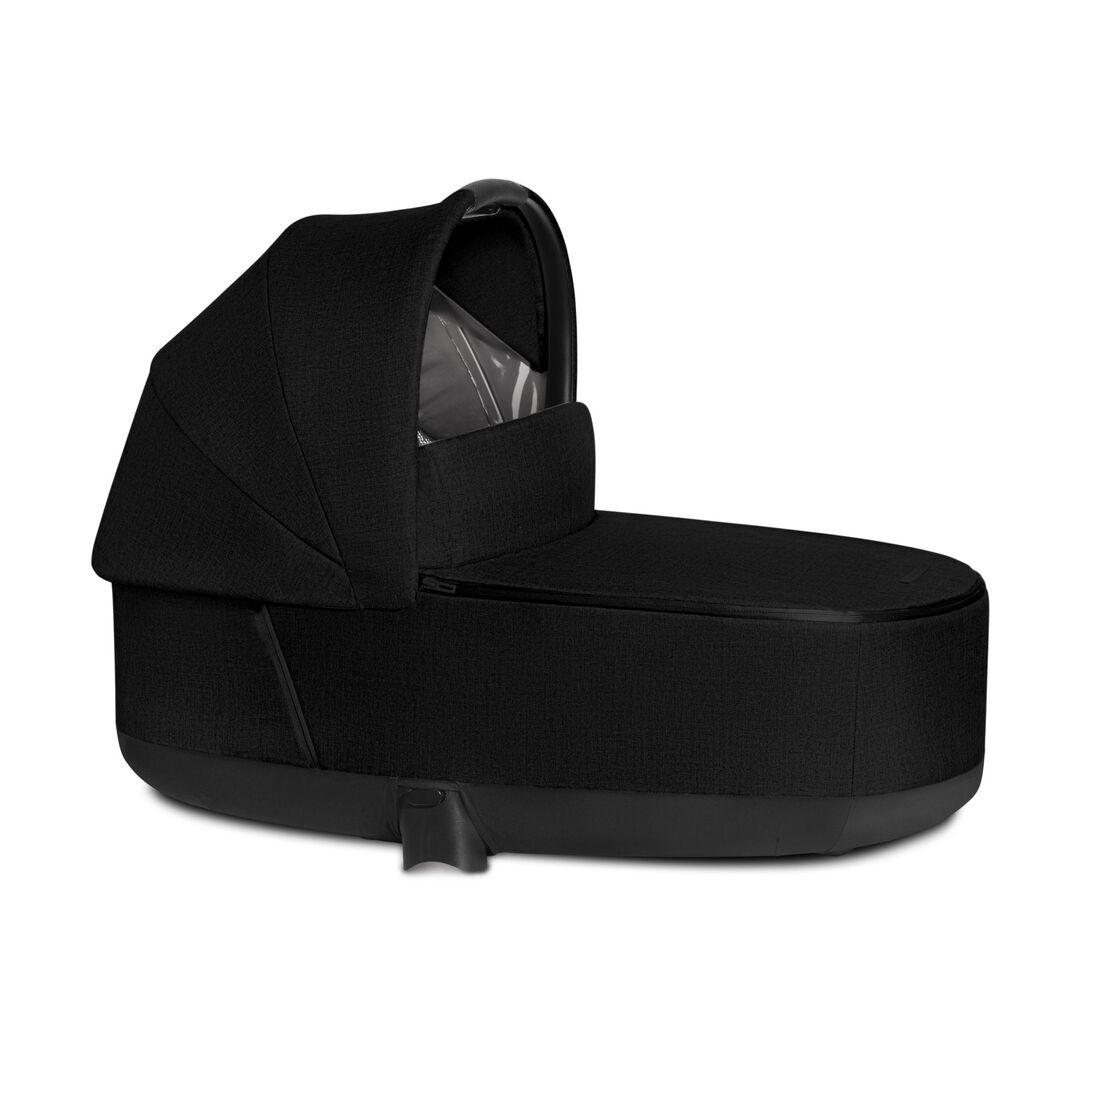 CYBEX Priam Lux Carry Cot - Stardust Black Plus in Stardust Black Plus large Bild 1